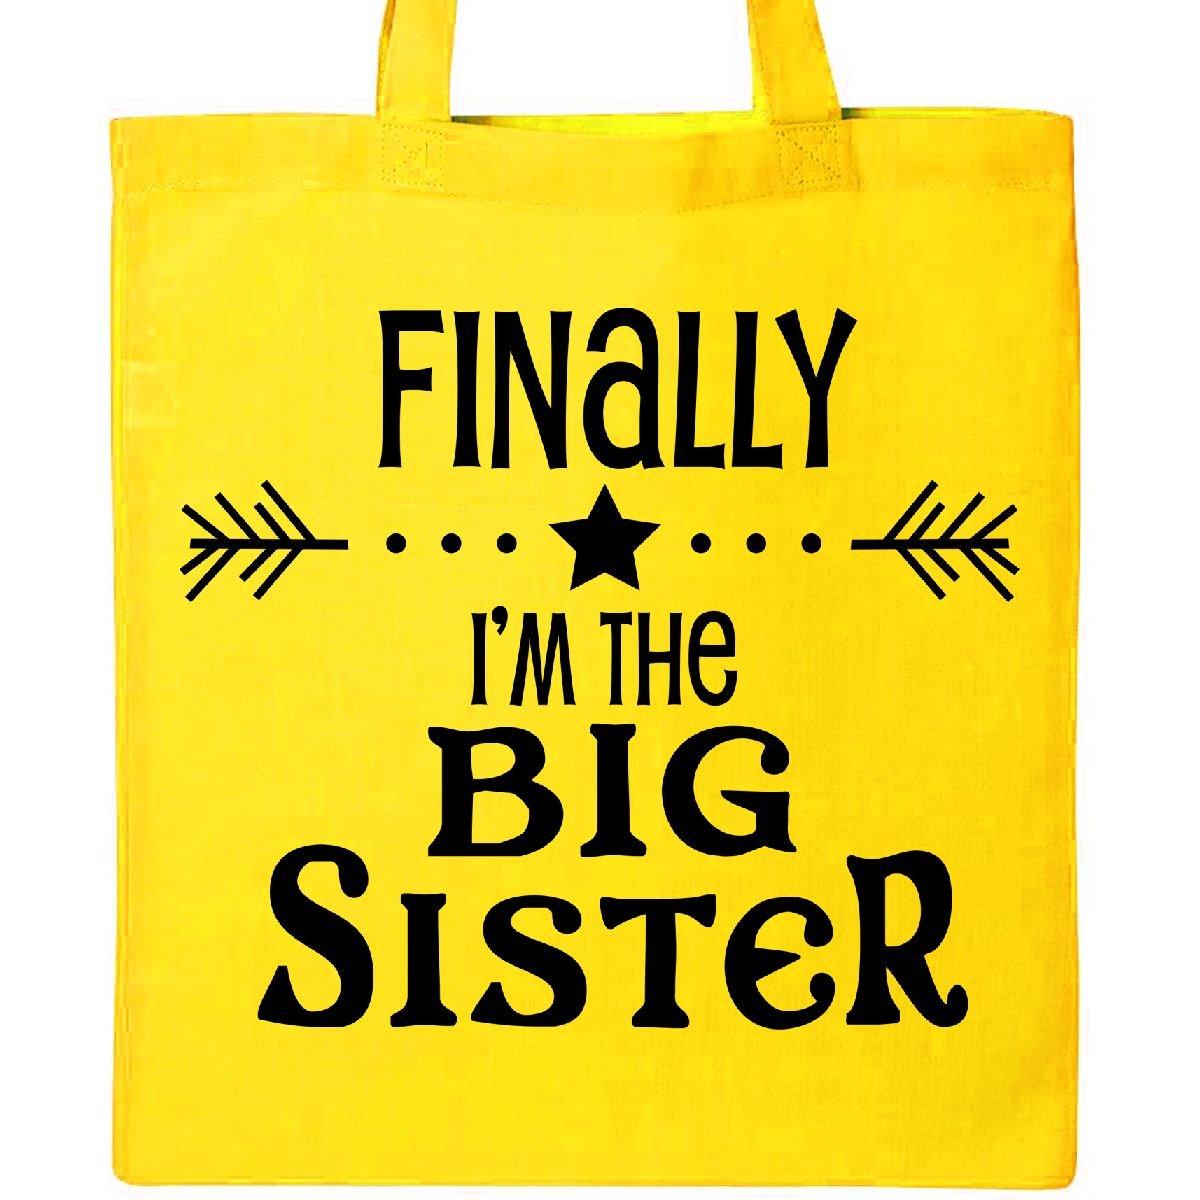 Inktastic – 最後にI ' m The Big Sisterトートバッグ One Size イエロー B077GJRZV6 イエロー イエロー